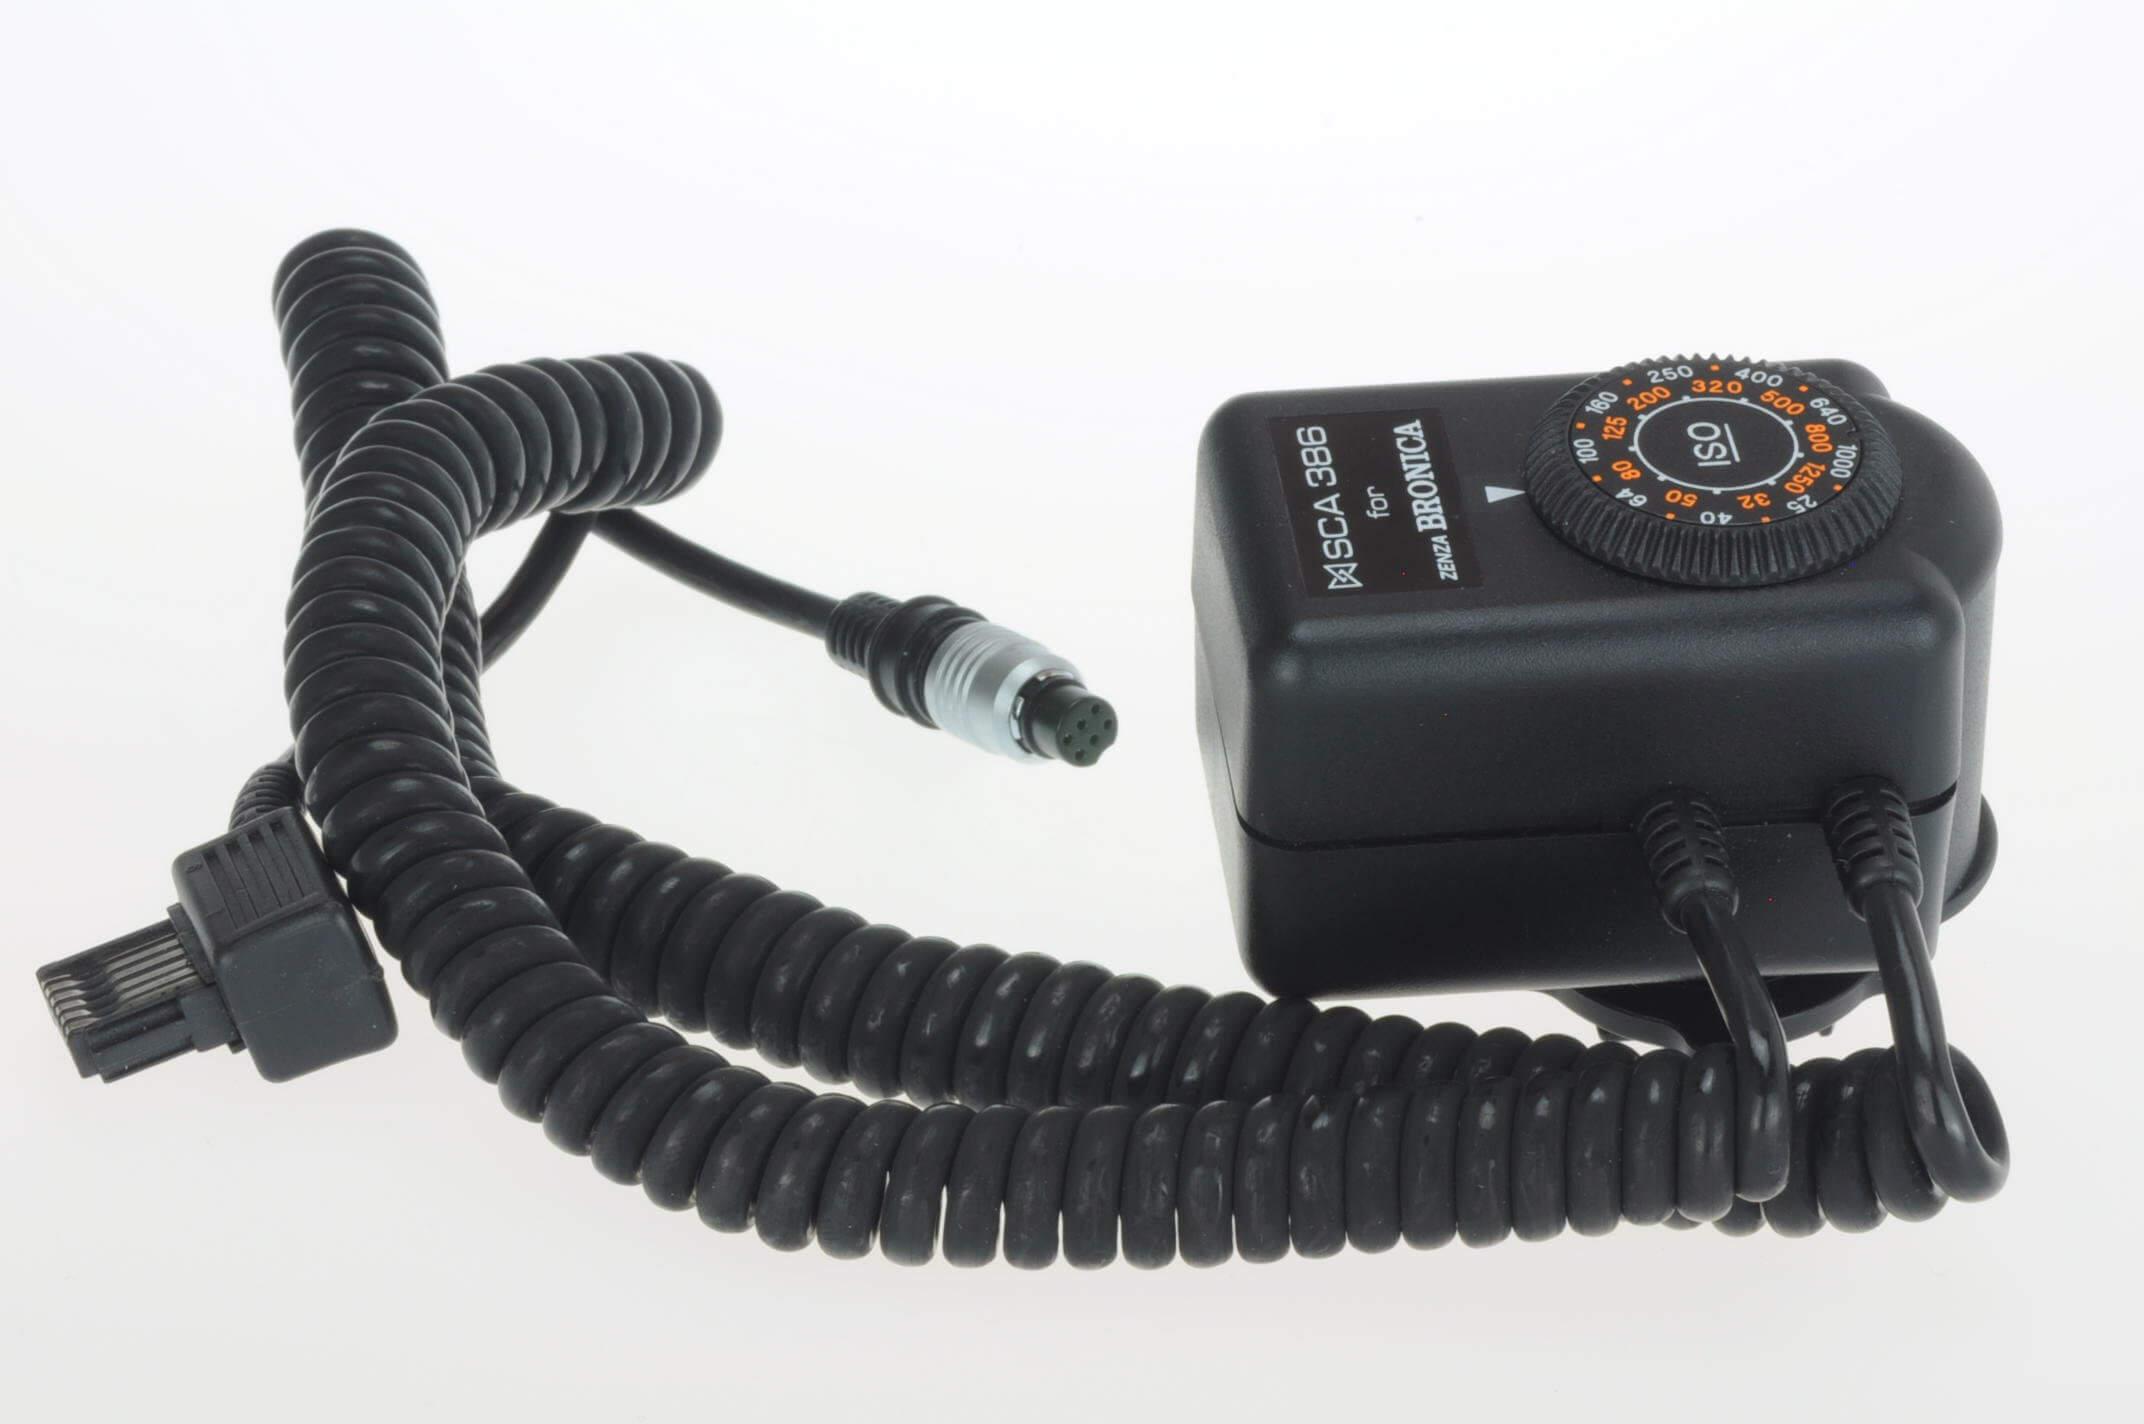 Bronica SCA 386 TTL flash adaptor